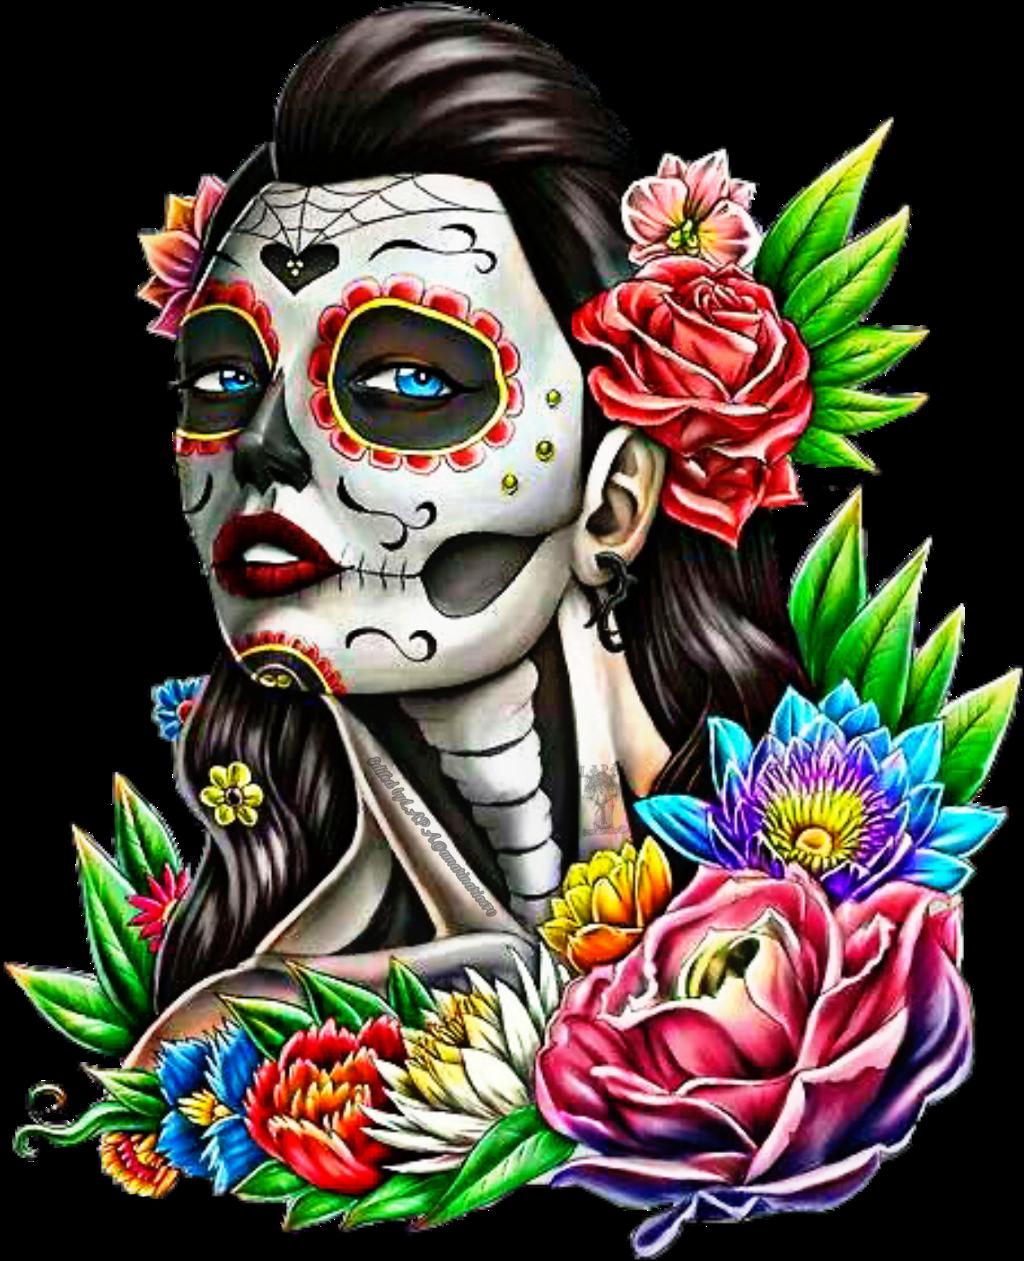 #challenge #diadelosmuertos #sticker #diadelosmuertossticker #sugarskullgirl #sugarskull #flowers #picartedit #picartstickers #picart #photooftheday #photographer #photography #artist @amarinarios70 #freetoedit